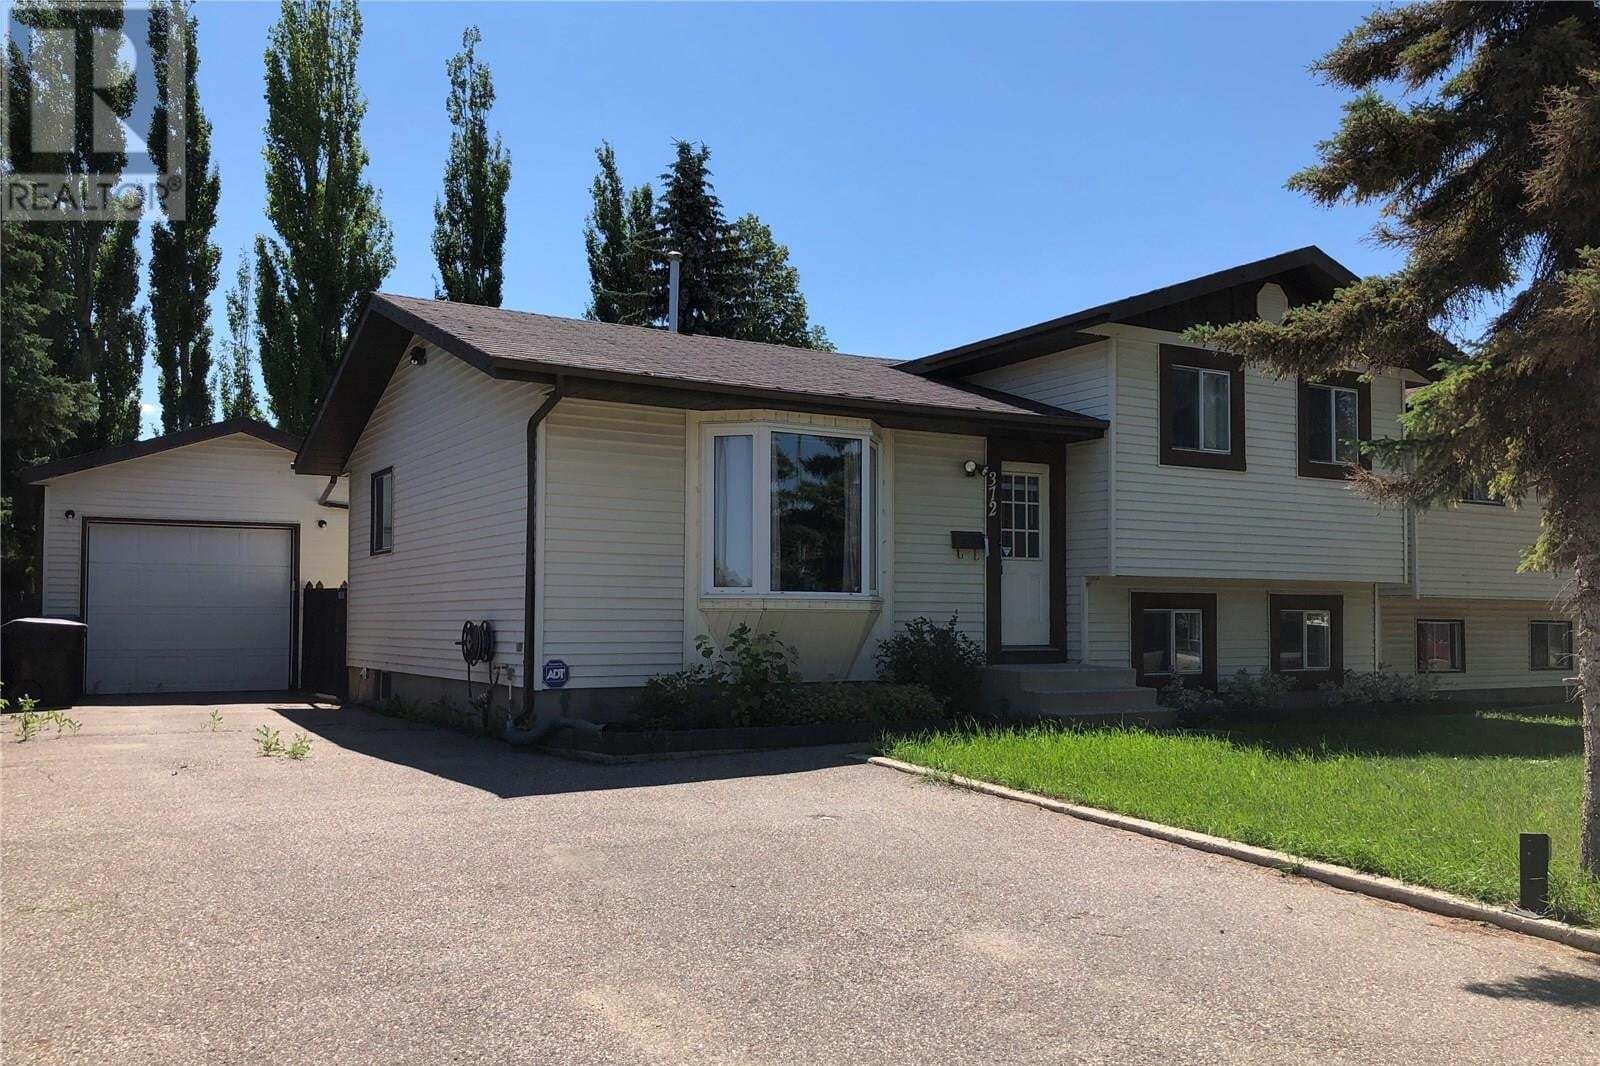 House for sale at 372 Russell Rd Saskatoon Saskatchewan - MLS: SK821126